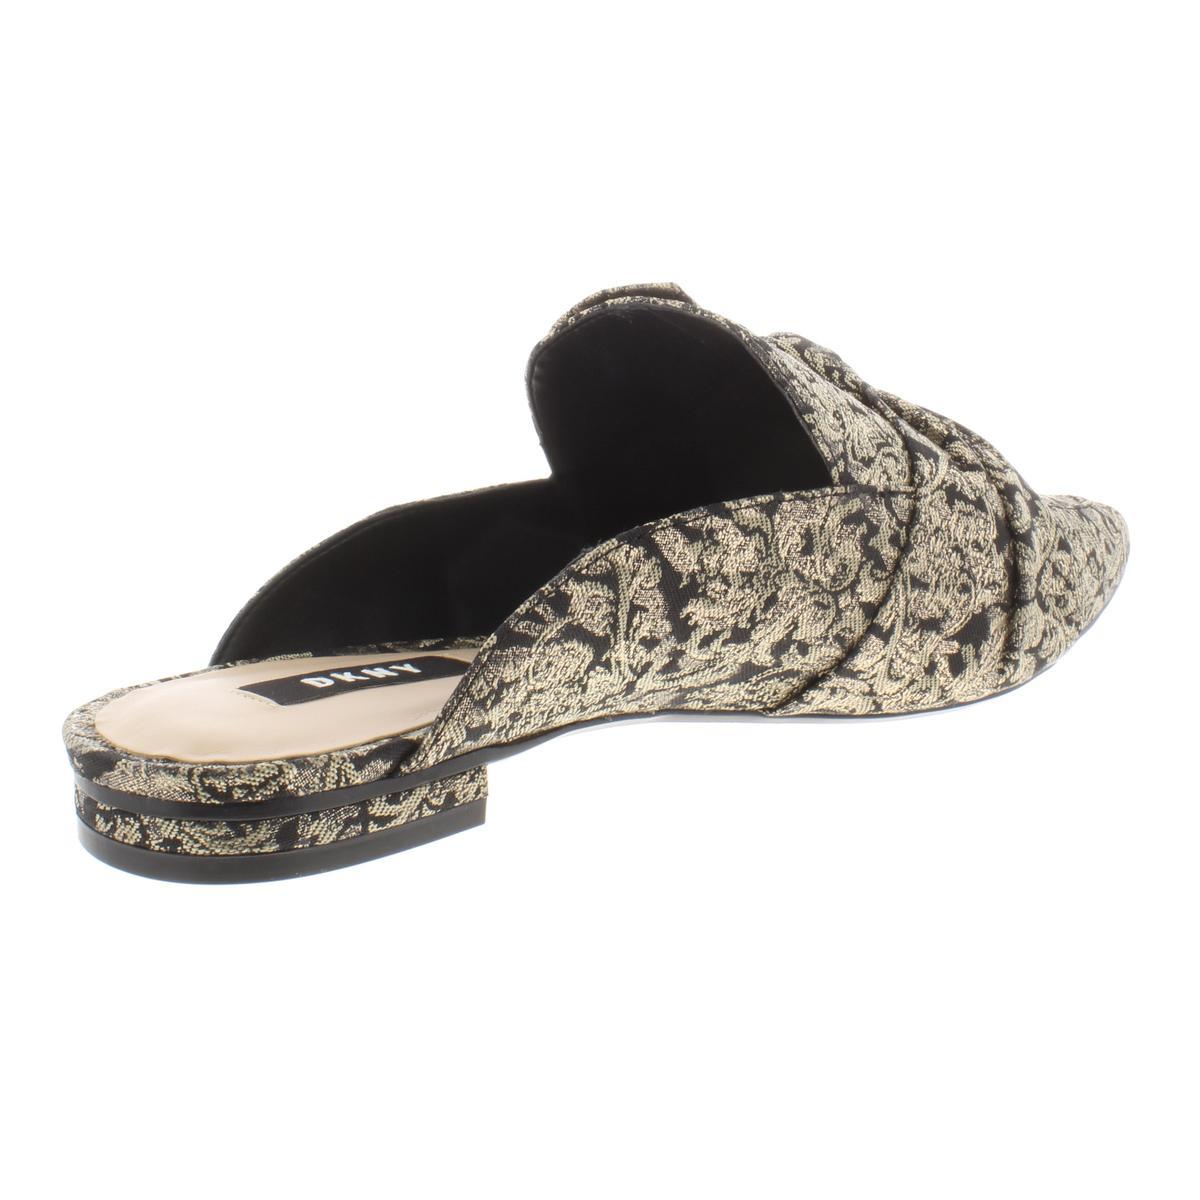 DKNY-Womens-Pier-Metallic-Dress-Slides-Mules-Flats-BHFO-6684 thumbnail 4